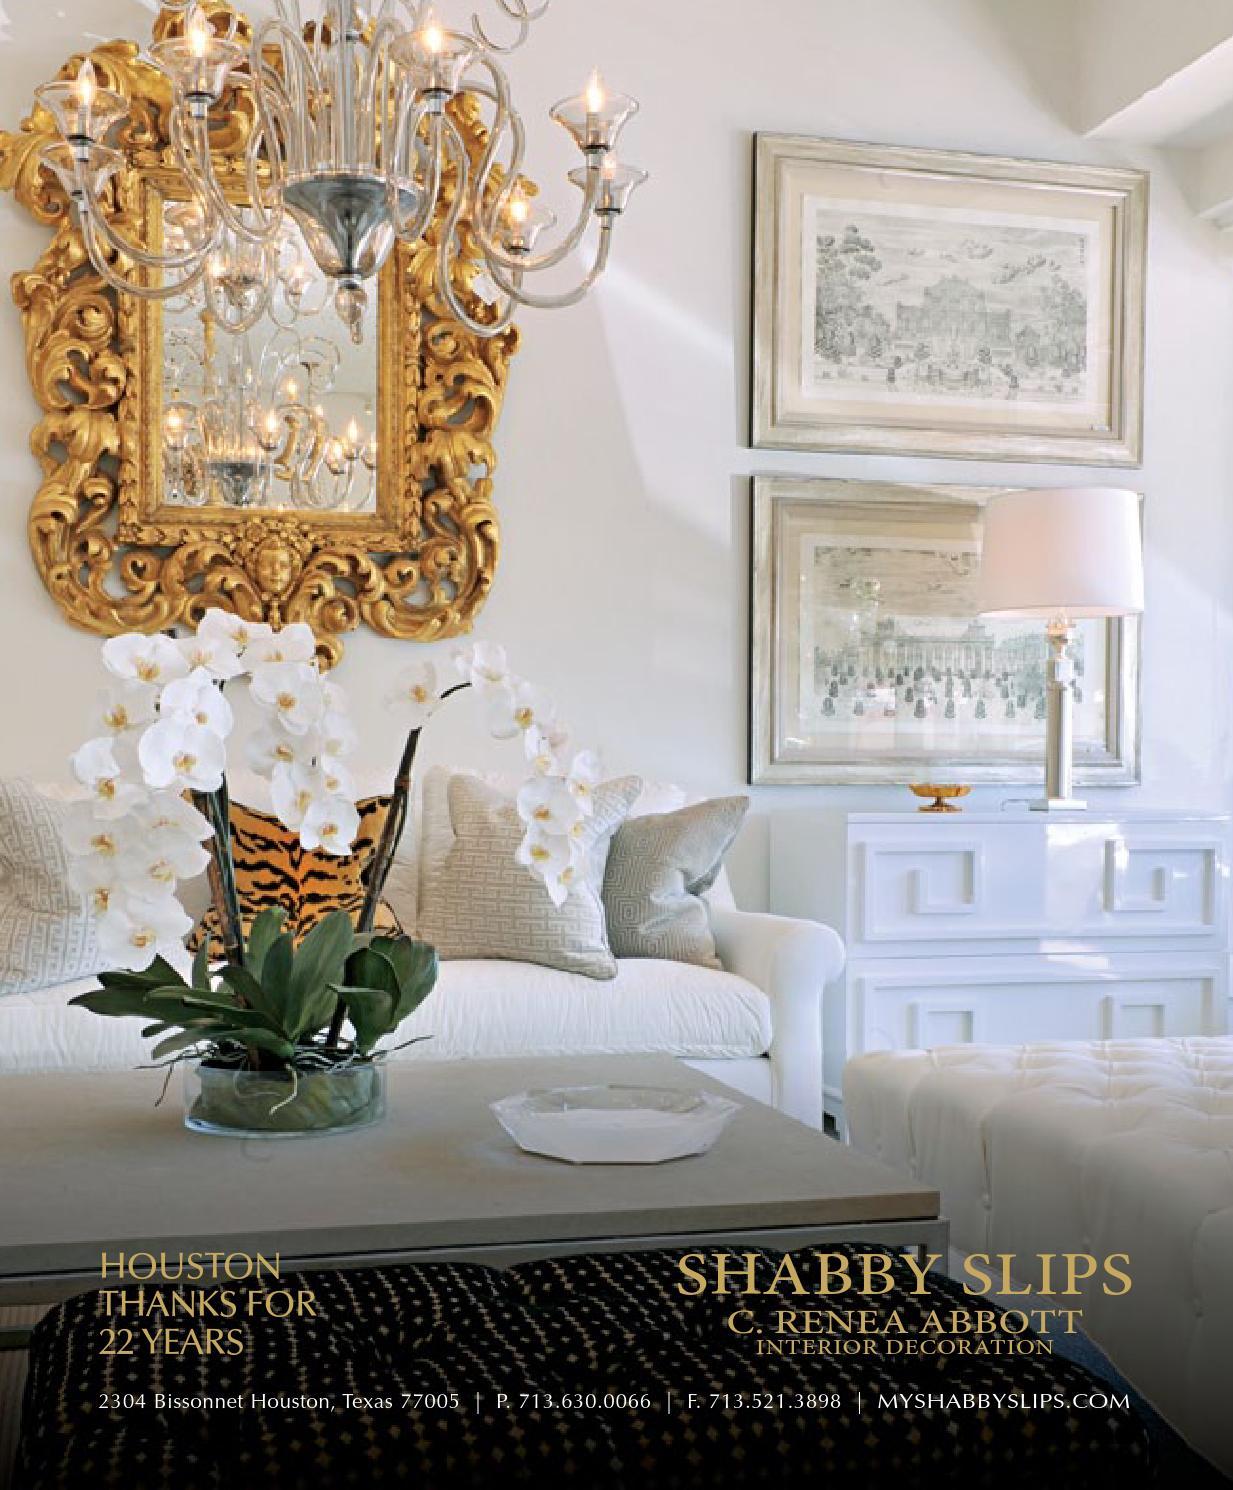 Shabby Slips Houston : shabby, slips, houston, Issuu, SANDOW®